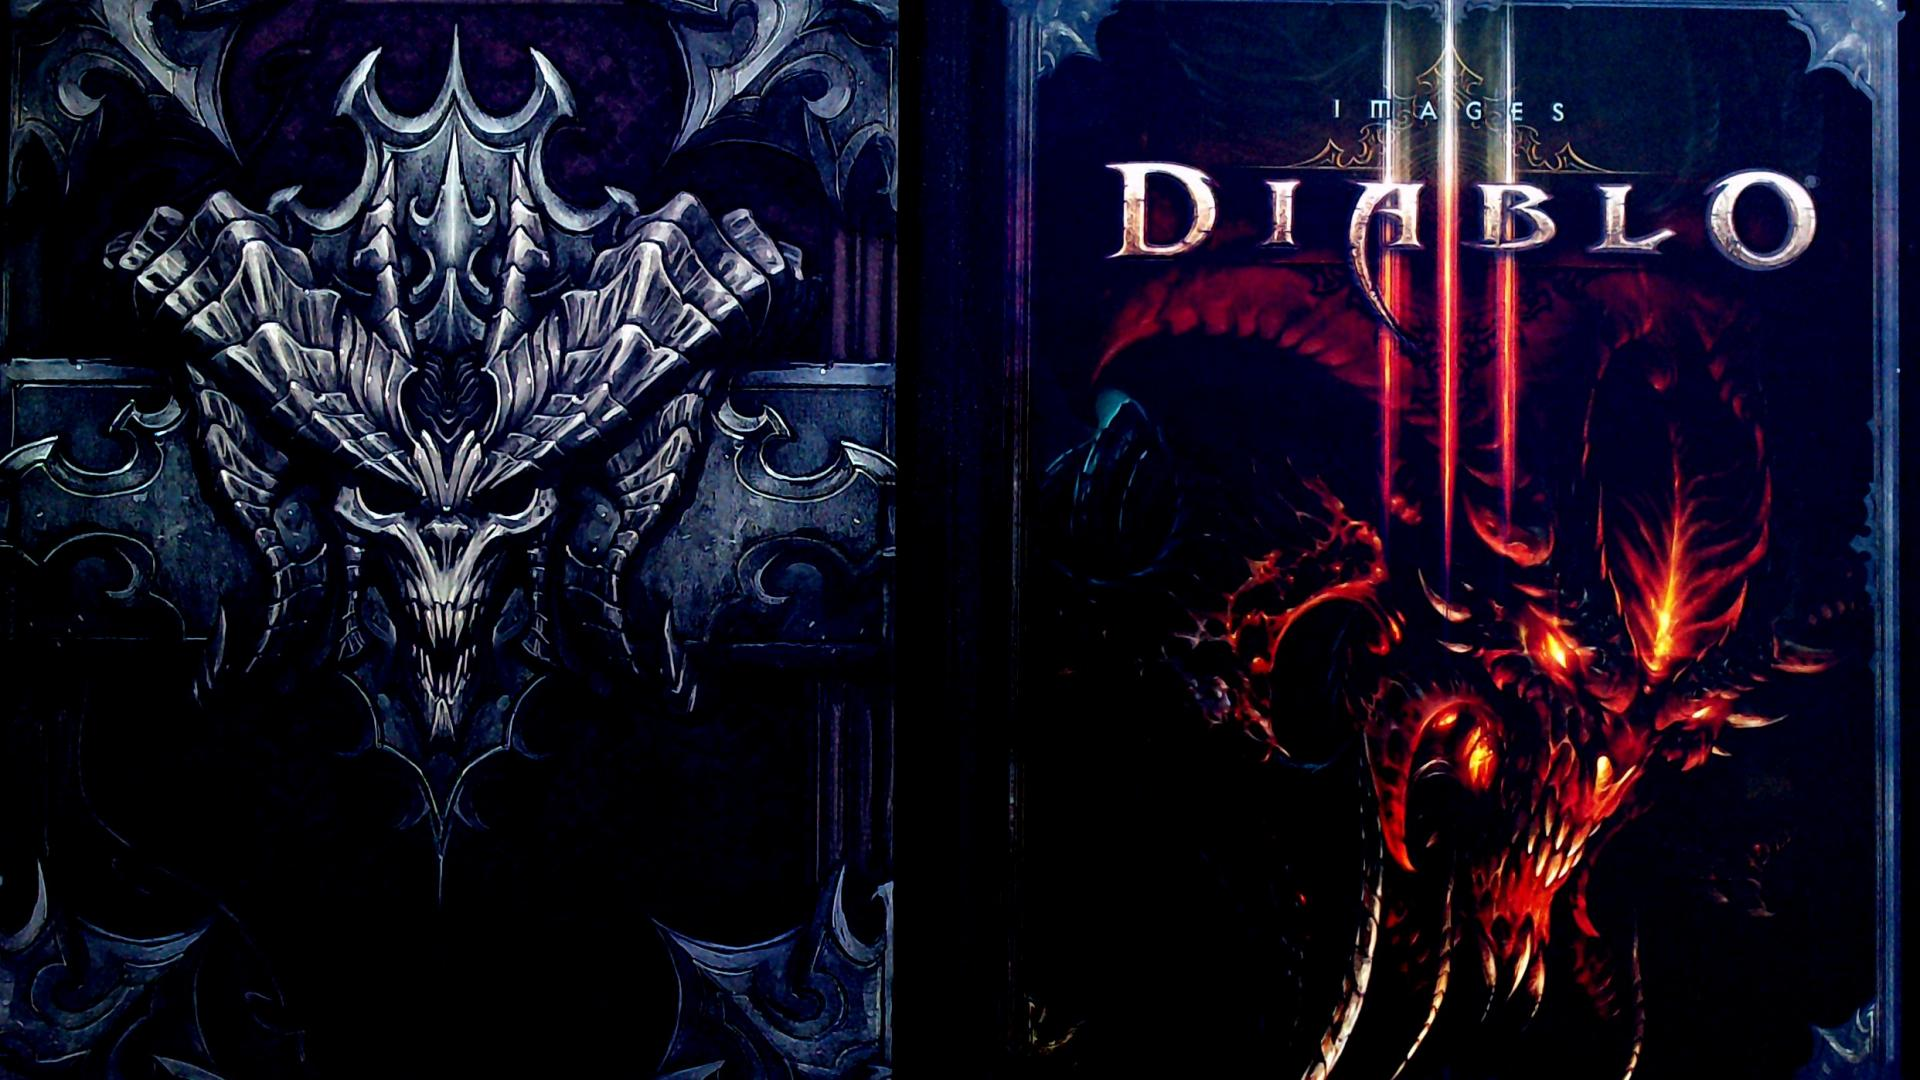 Diablo books blizzard entertainment iii demon wallpaper 52435 1920x1080